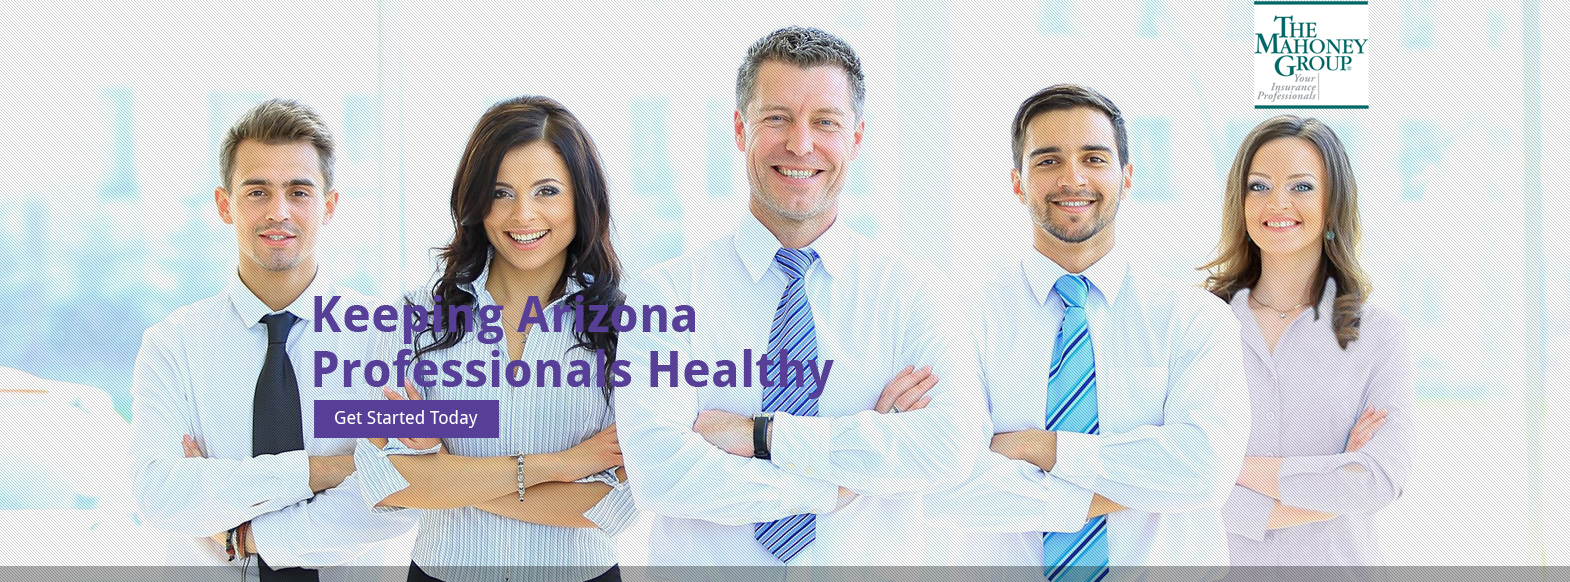 Keeping Arizona Professionals Healthy